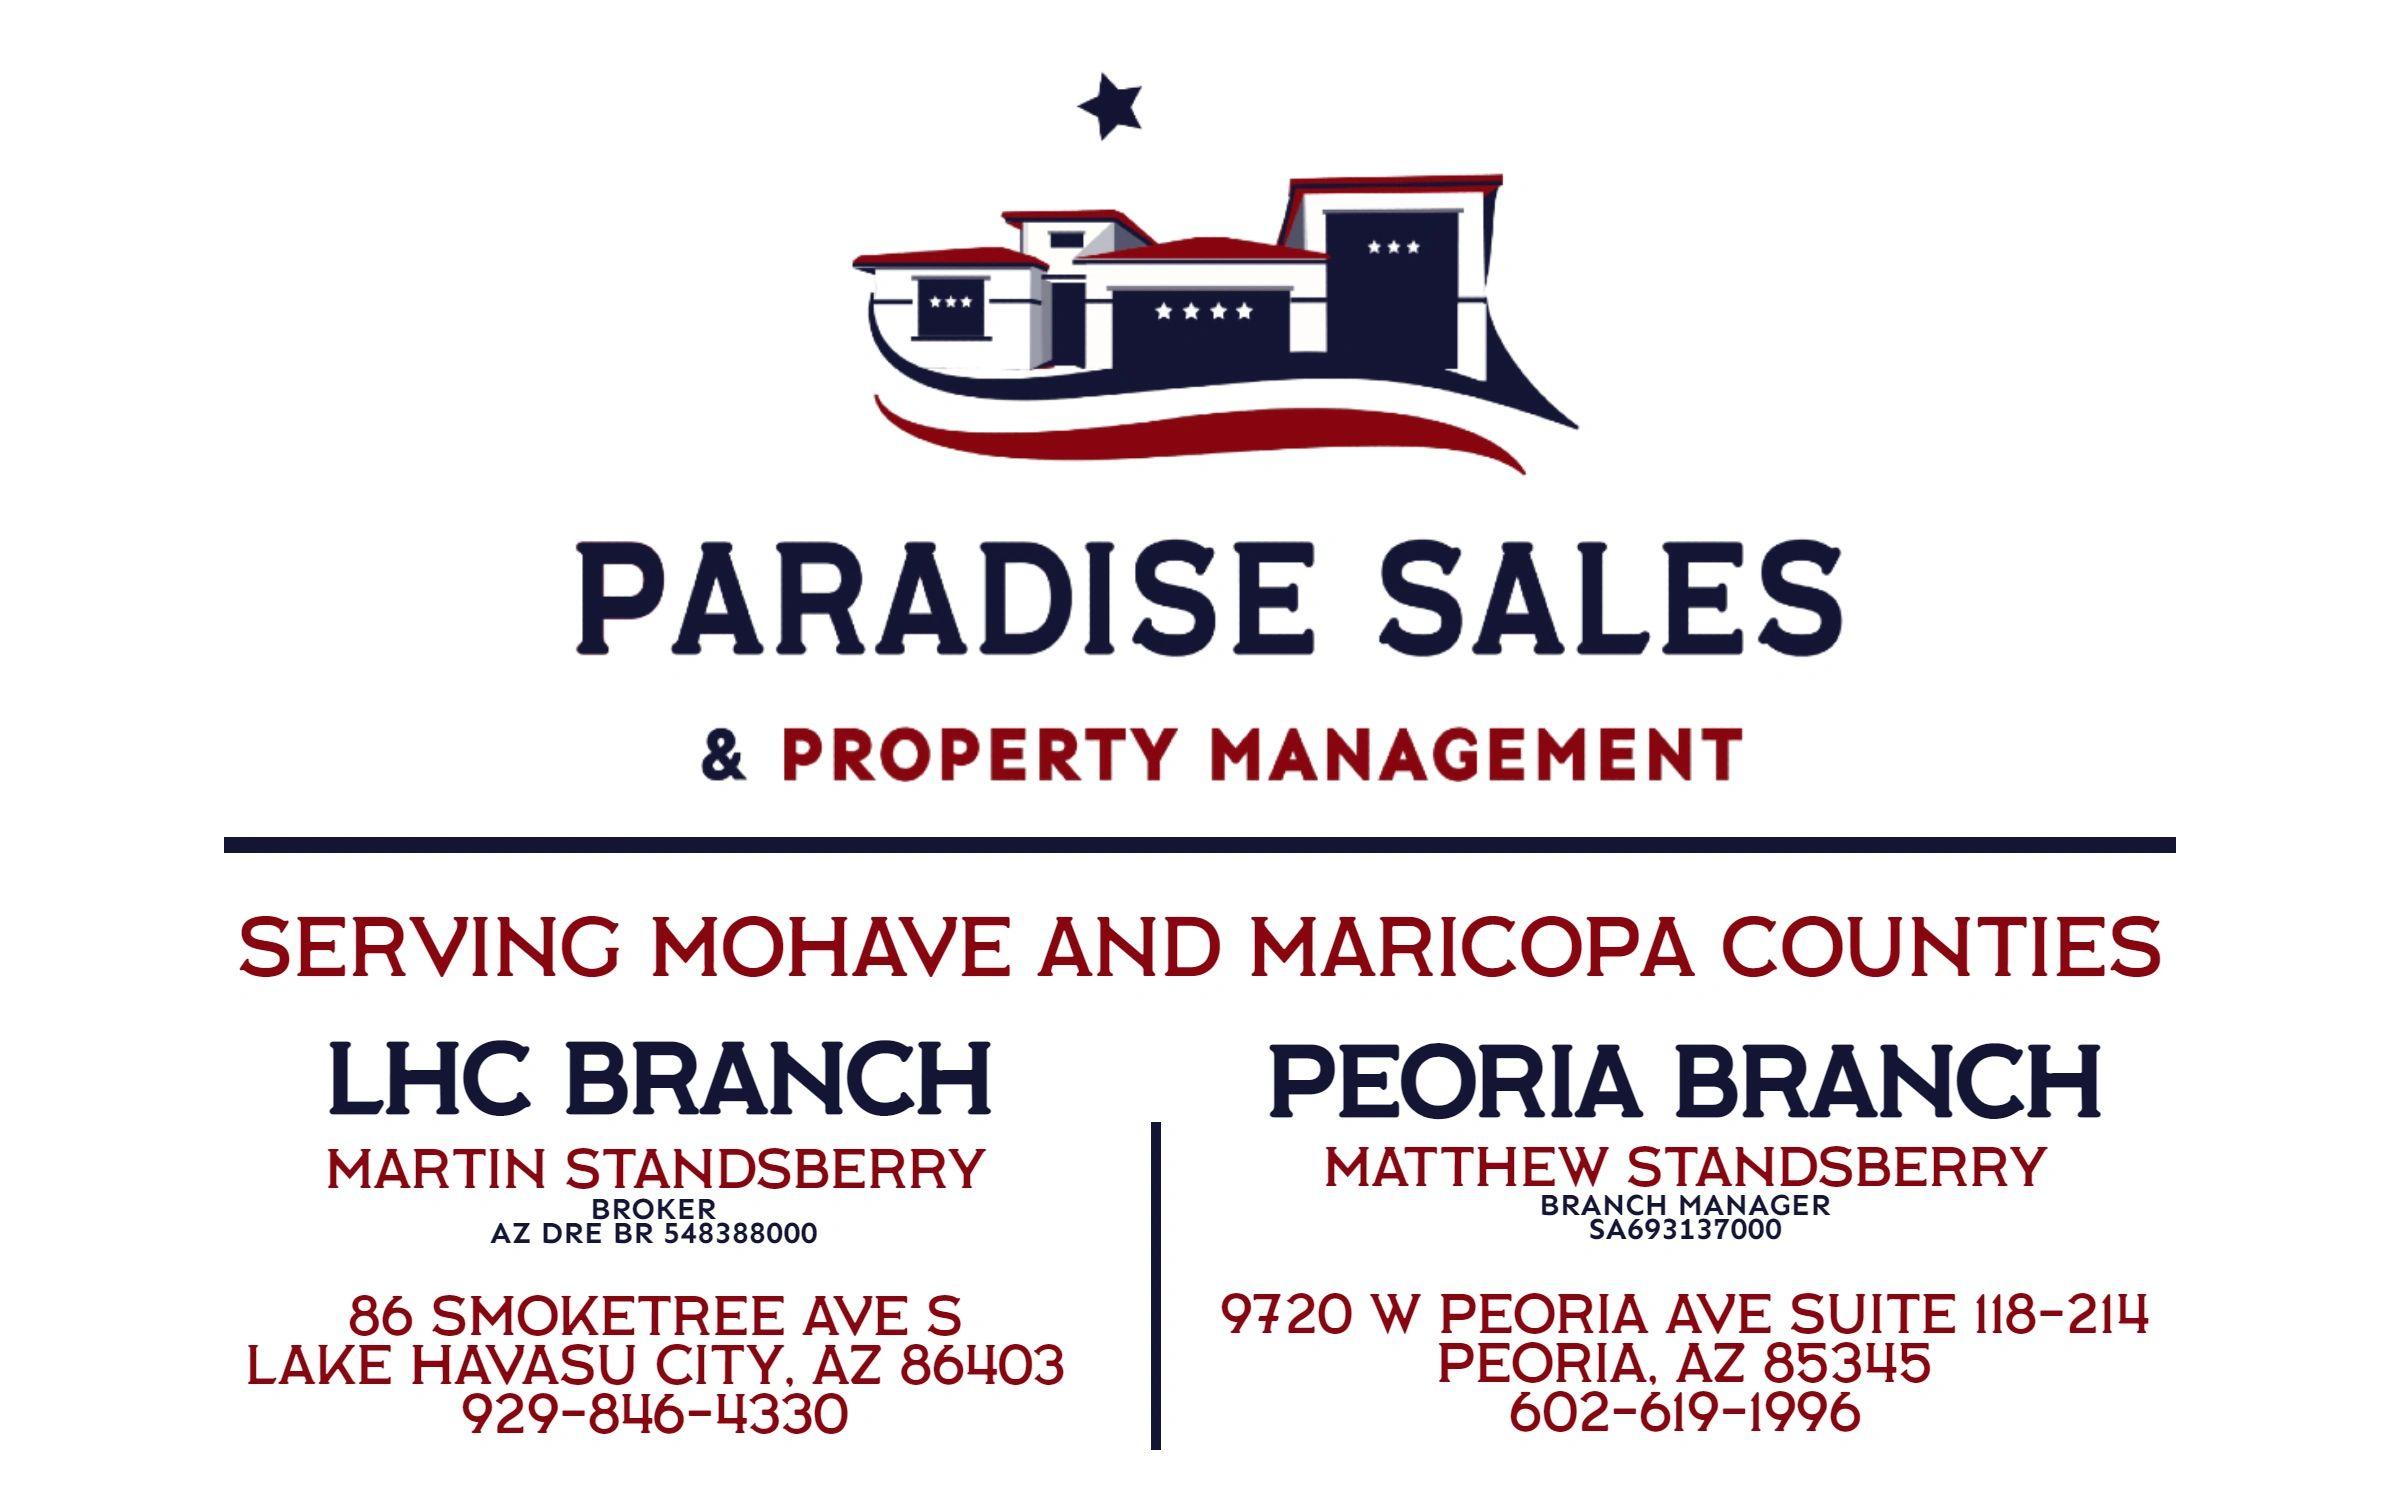 Paradise Sales & Property Management logo